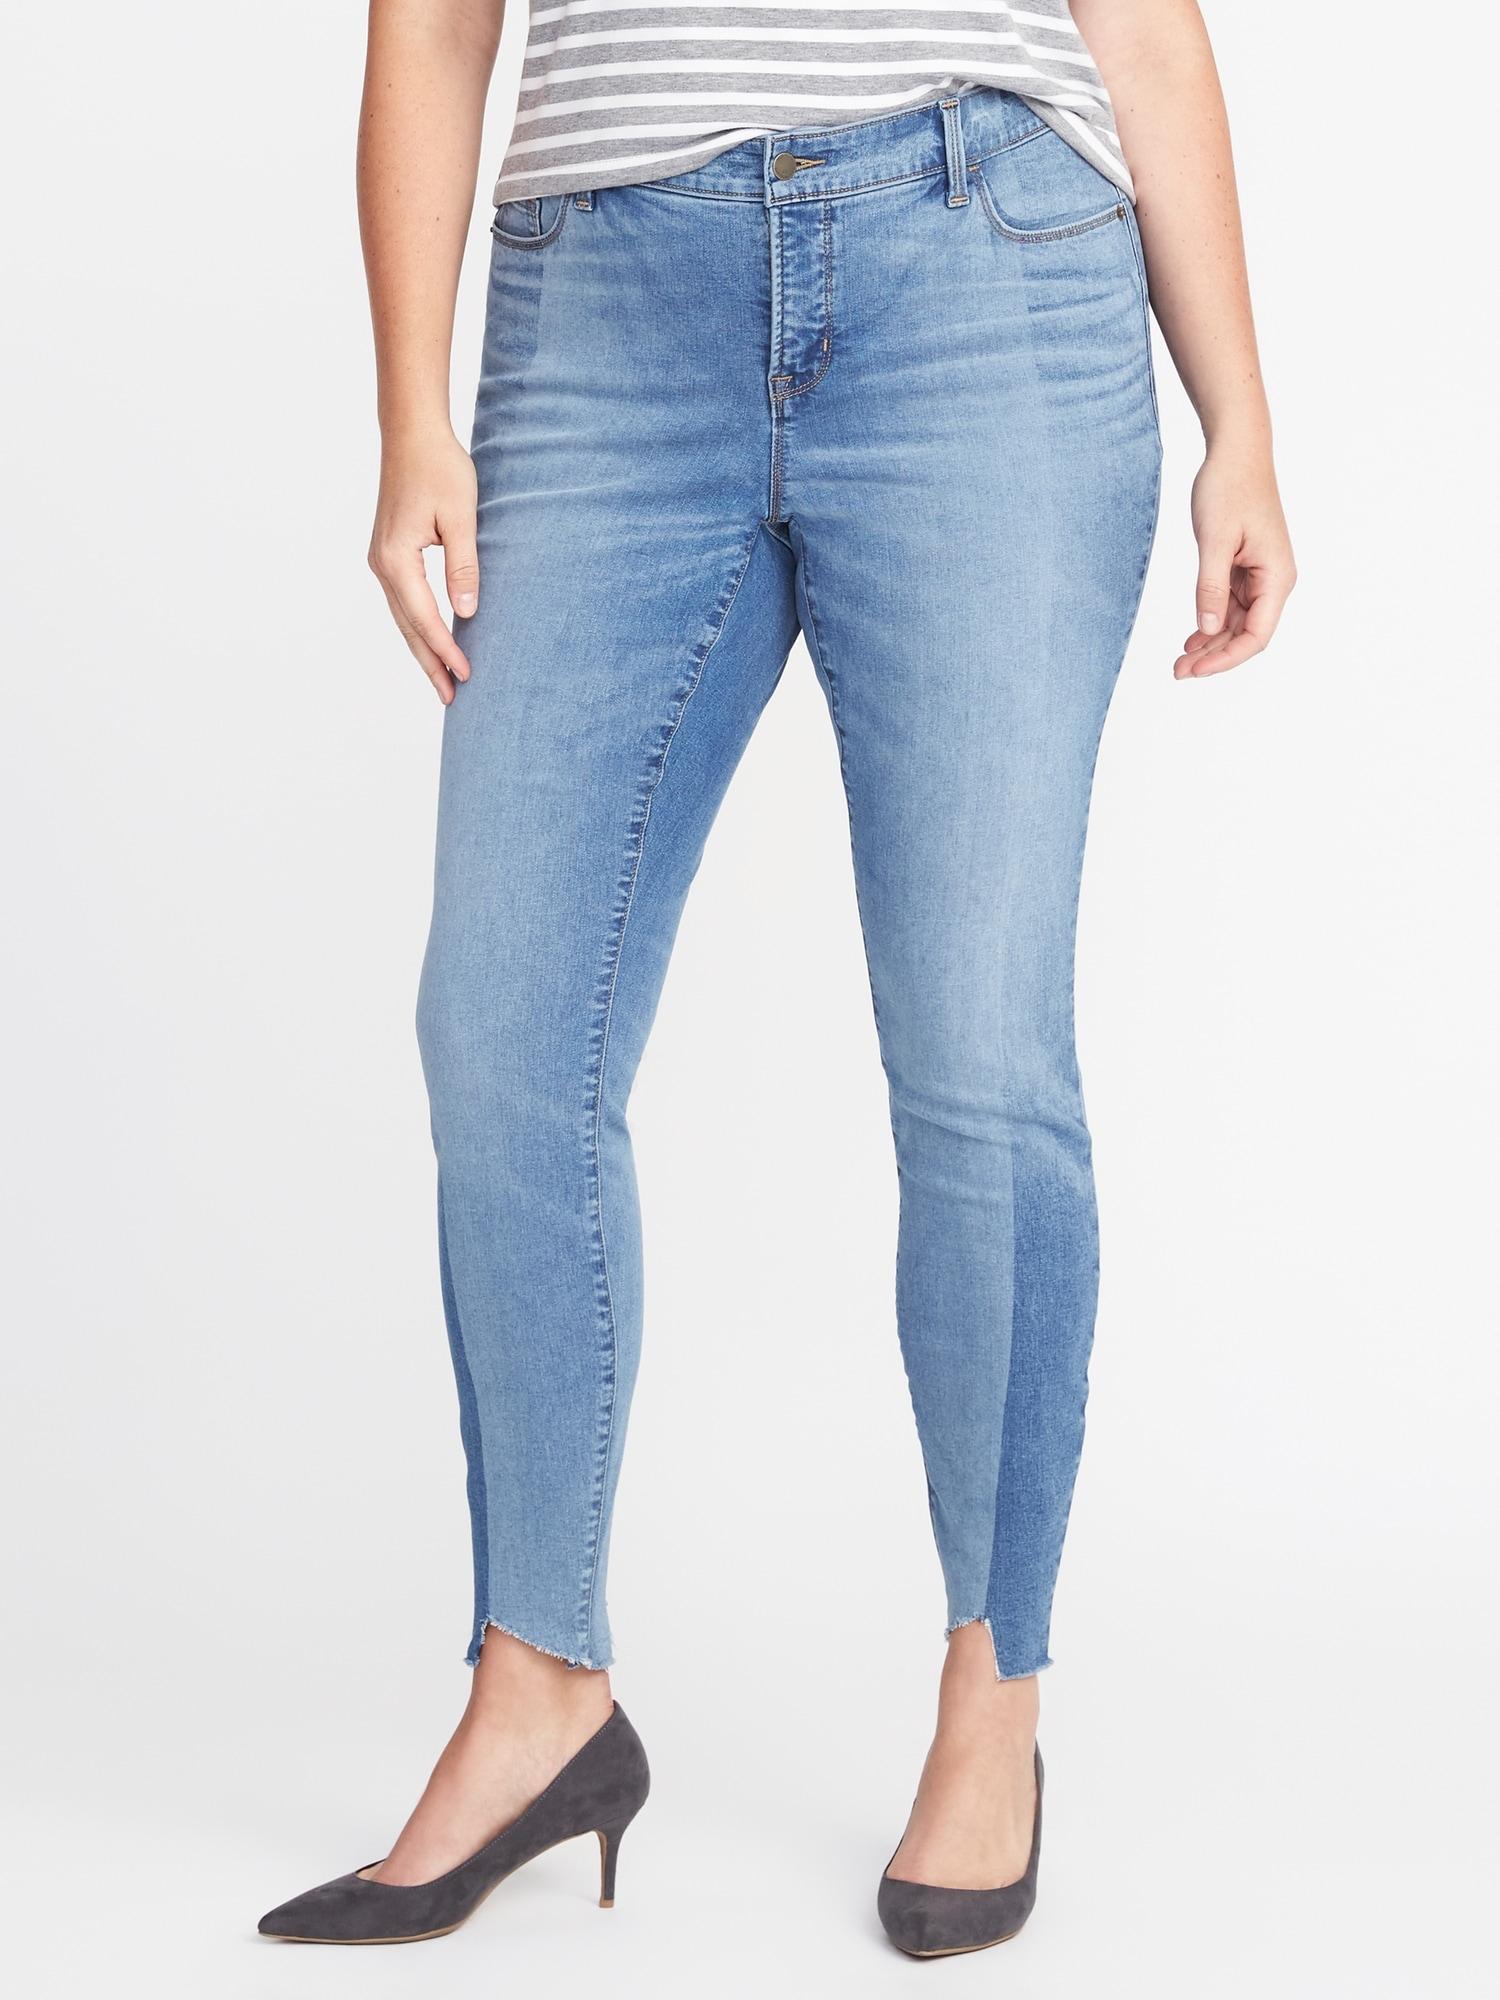 e2697c11bf36e High-Rise Secret-Slim Pockets Plus-Size Rockstar Jeans